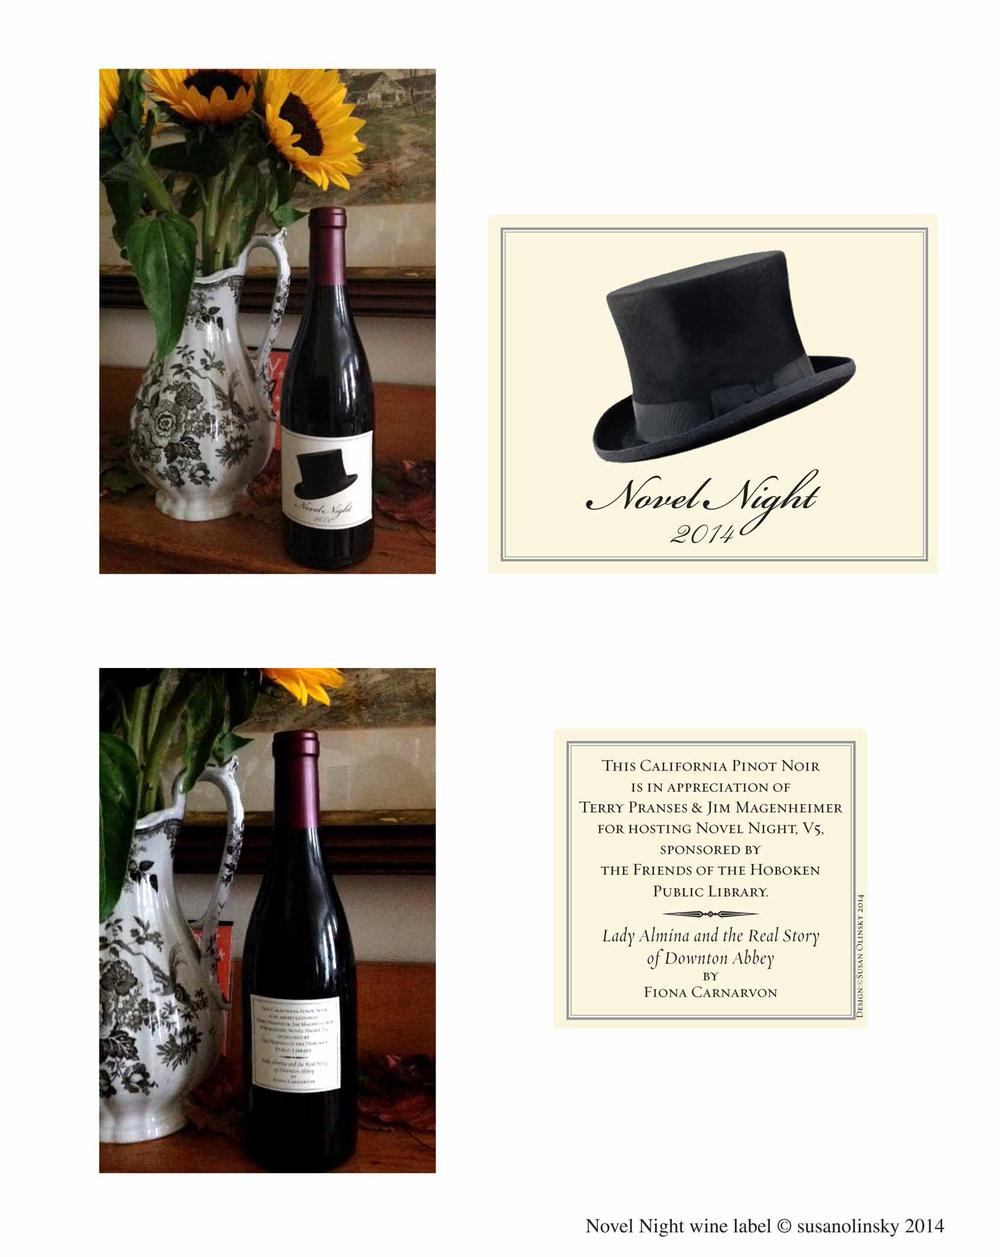 novel_night_2014_label.web.jpg